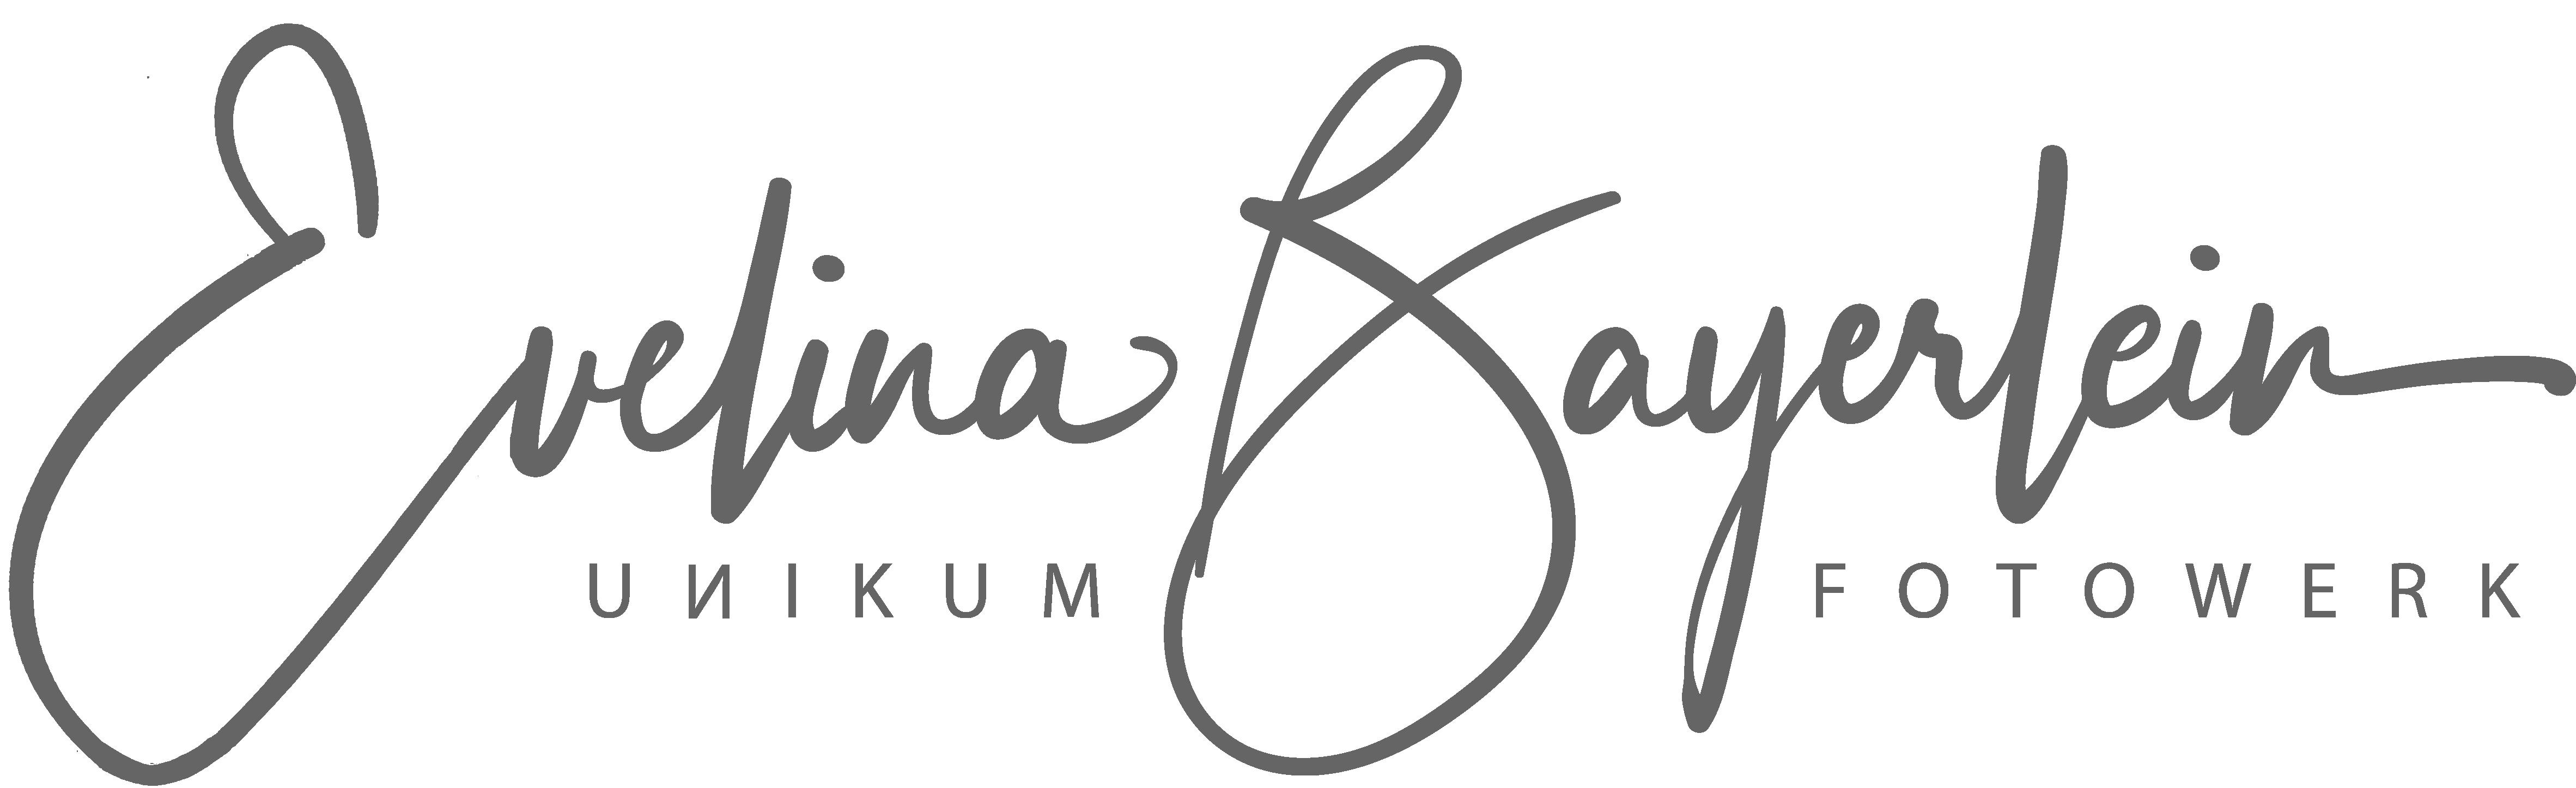 Unikum Fotowerk Fotografin Bamberg, Grafikdesign, Webdesign Evelina Bayerlein